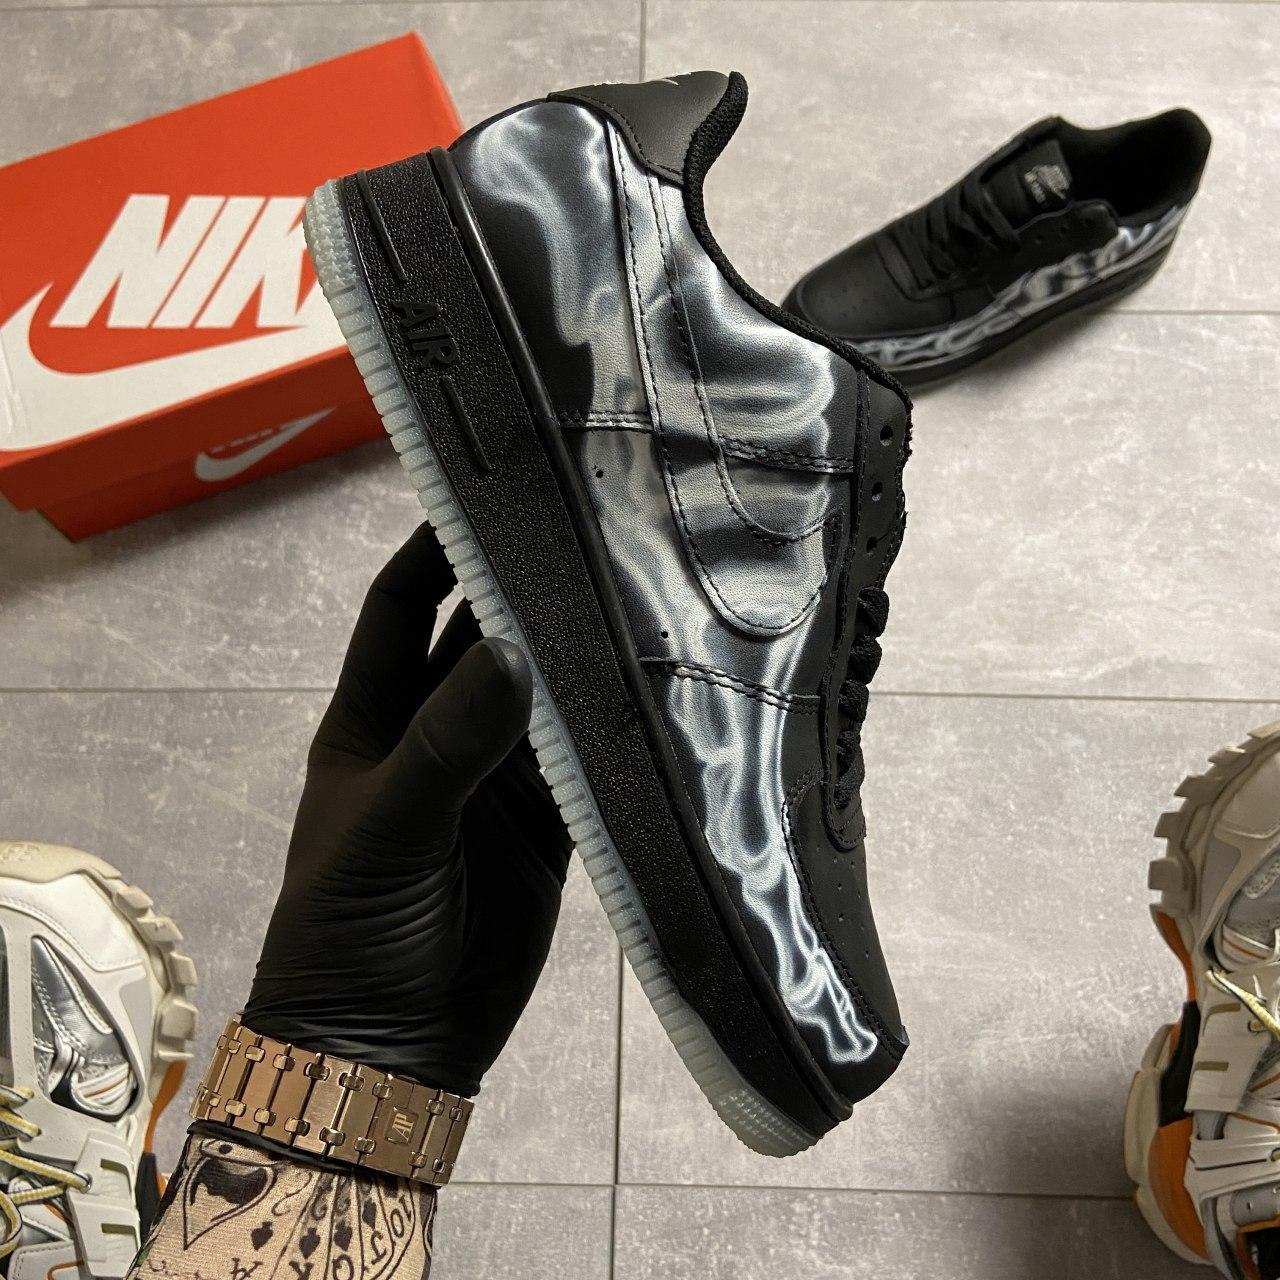 ВИДЕО 🔥 Кроссовки Nike Air Force 1 Skeleton Black Найк Аир Форс Черный Скелетон 🔥 Найк мужские кроссовки 🔥